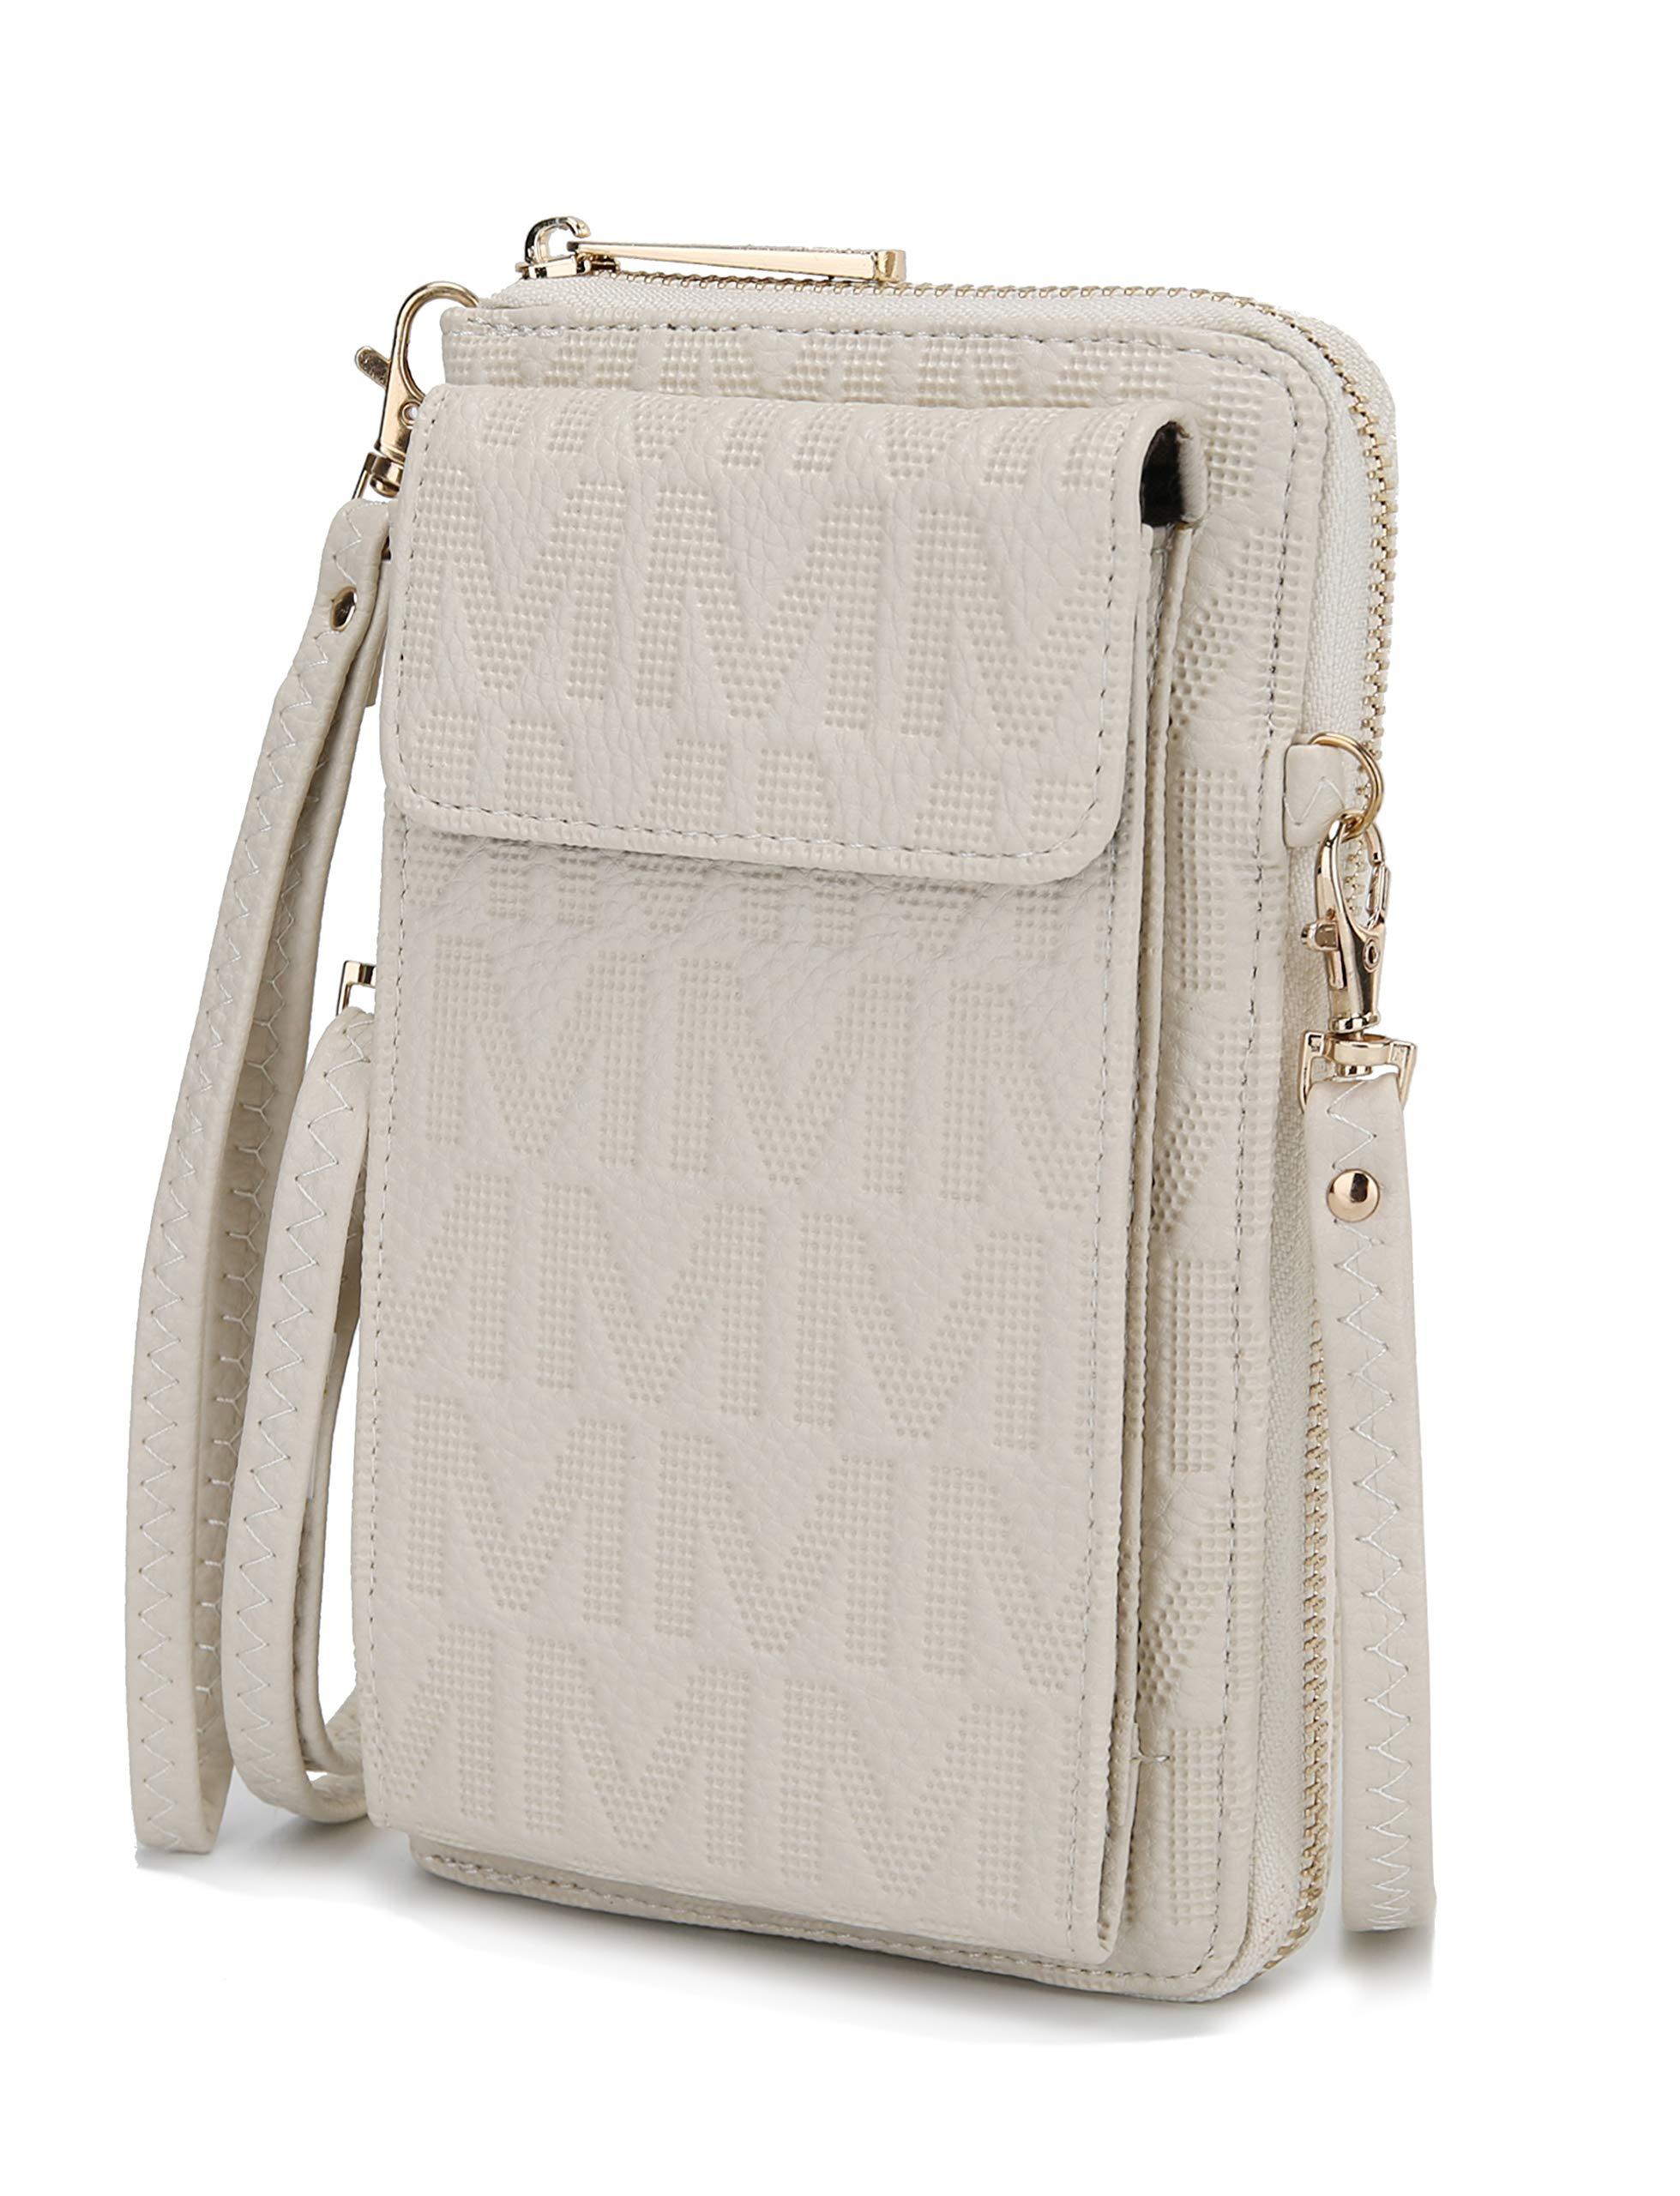 MKF Crossbody Cellphone Handbag for Women Wallet Purse – PU Leather Multi Pockets Clutch Bag Wristlet Strap